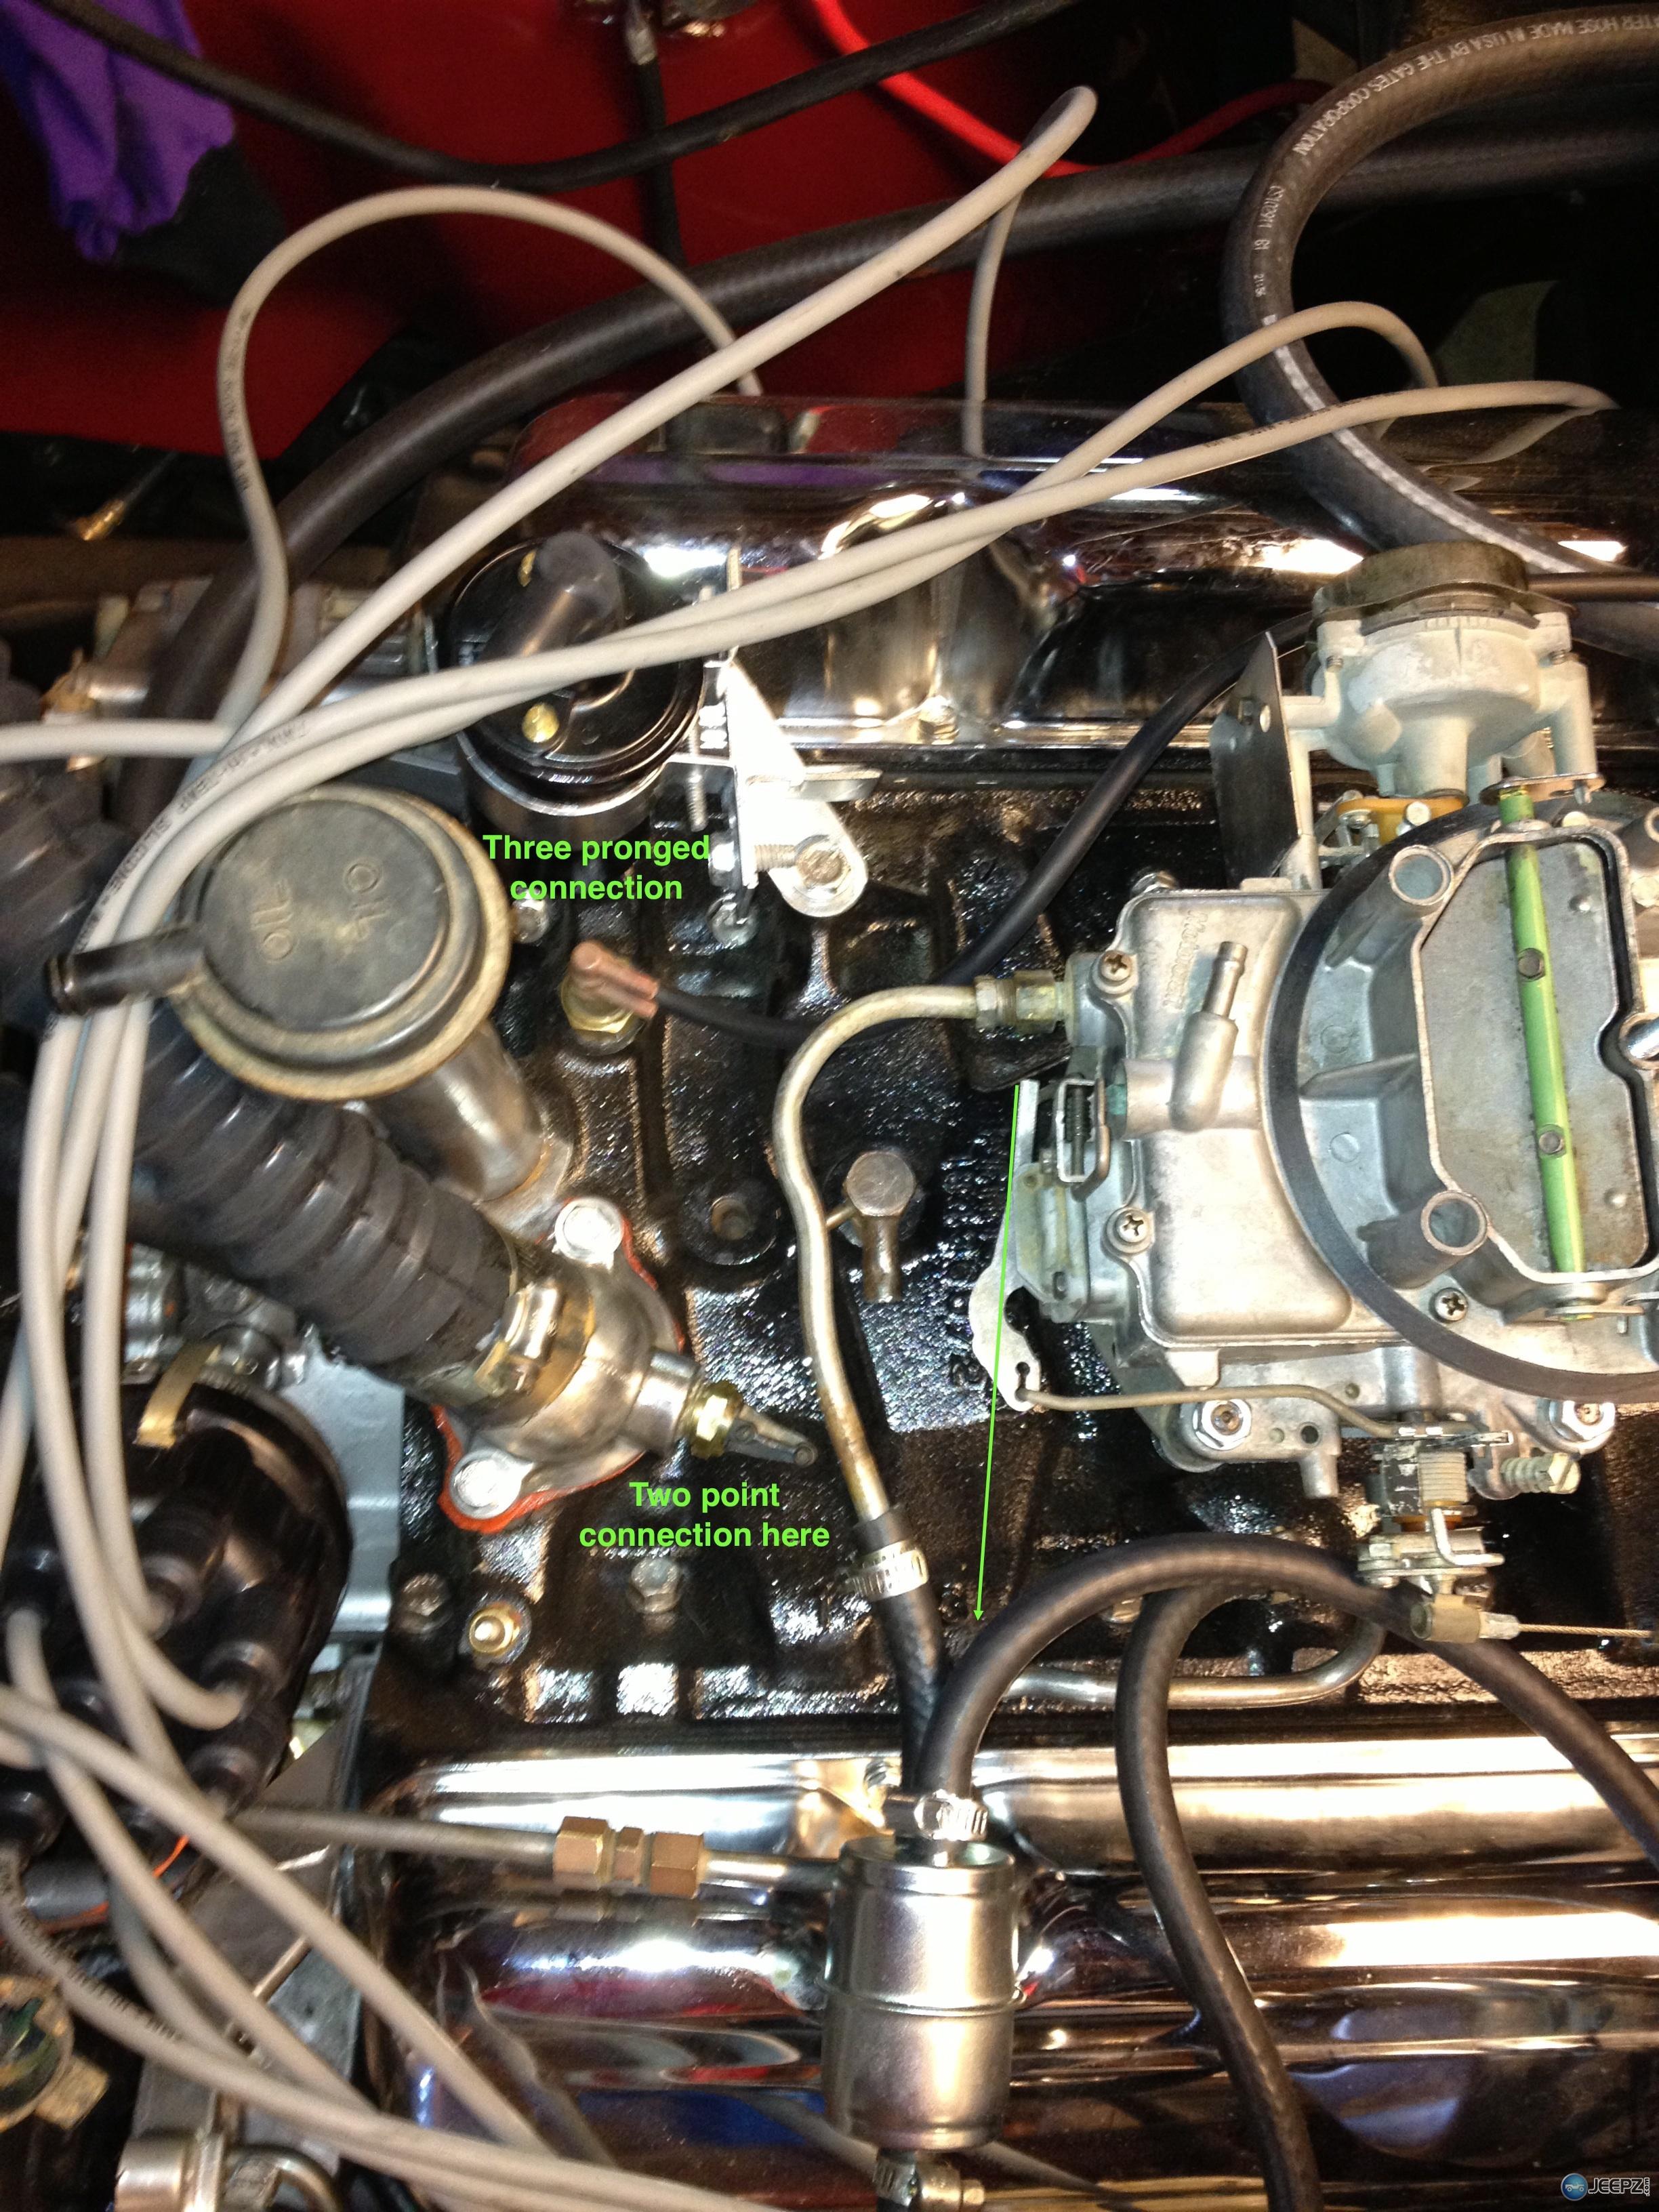 304 V8 Fuel And Vac Lines Underhood